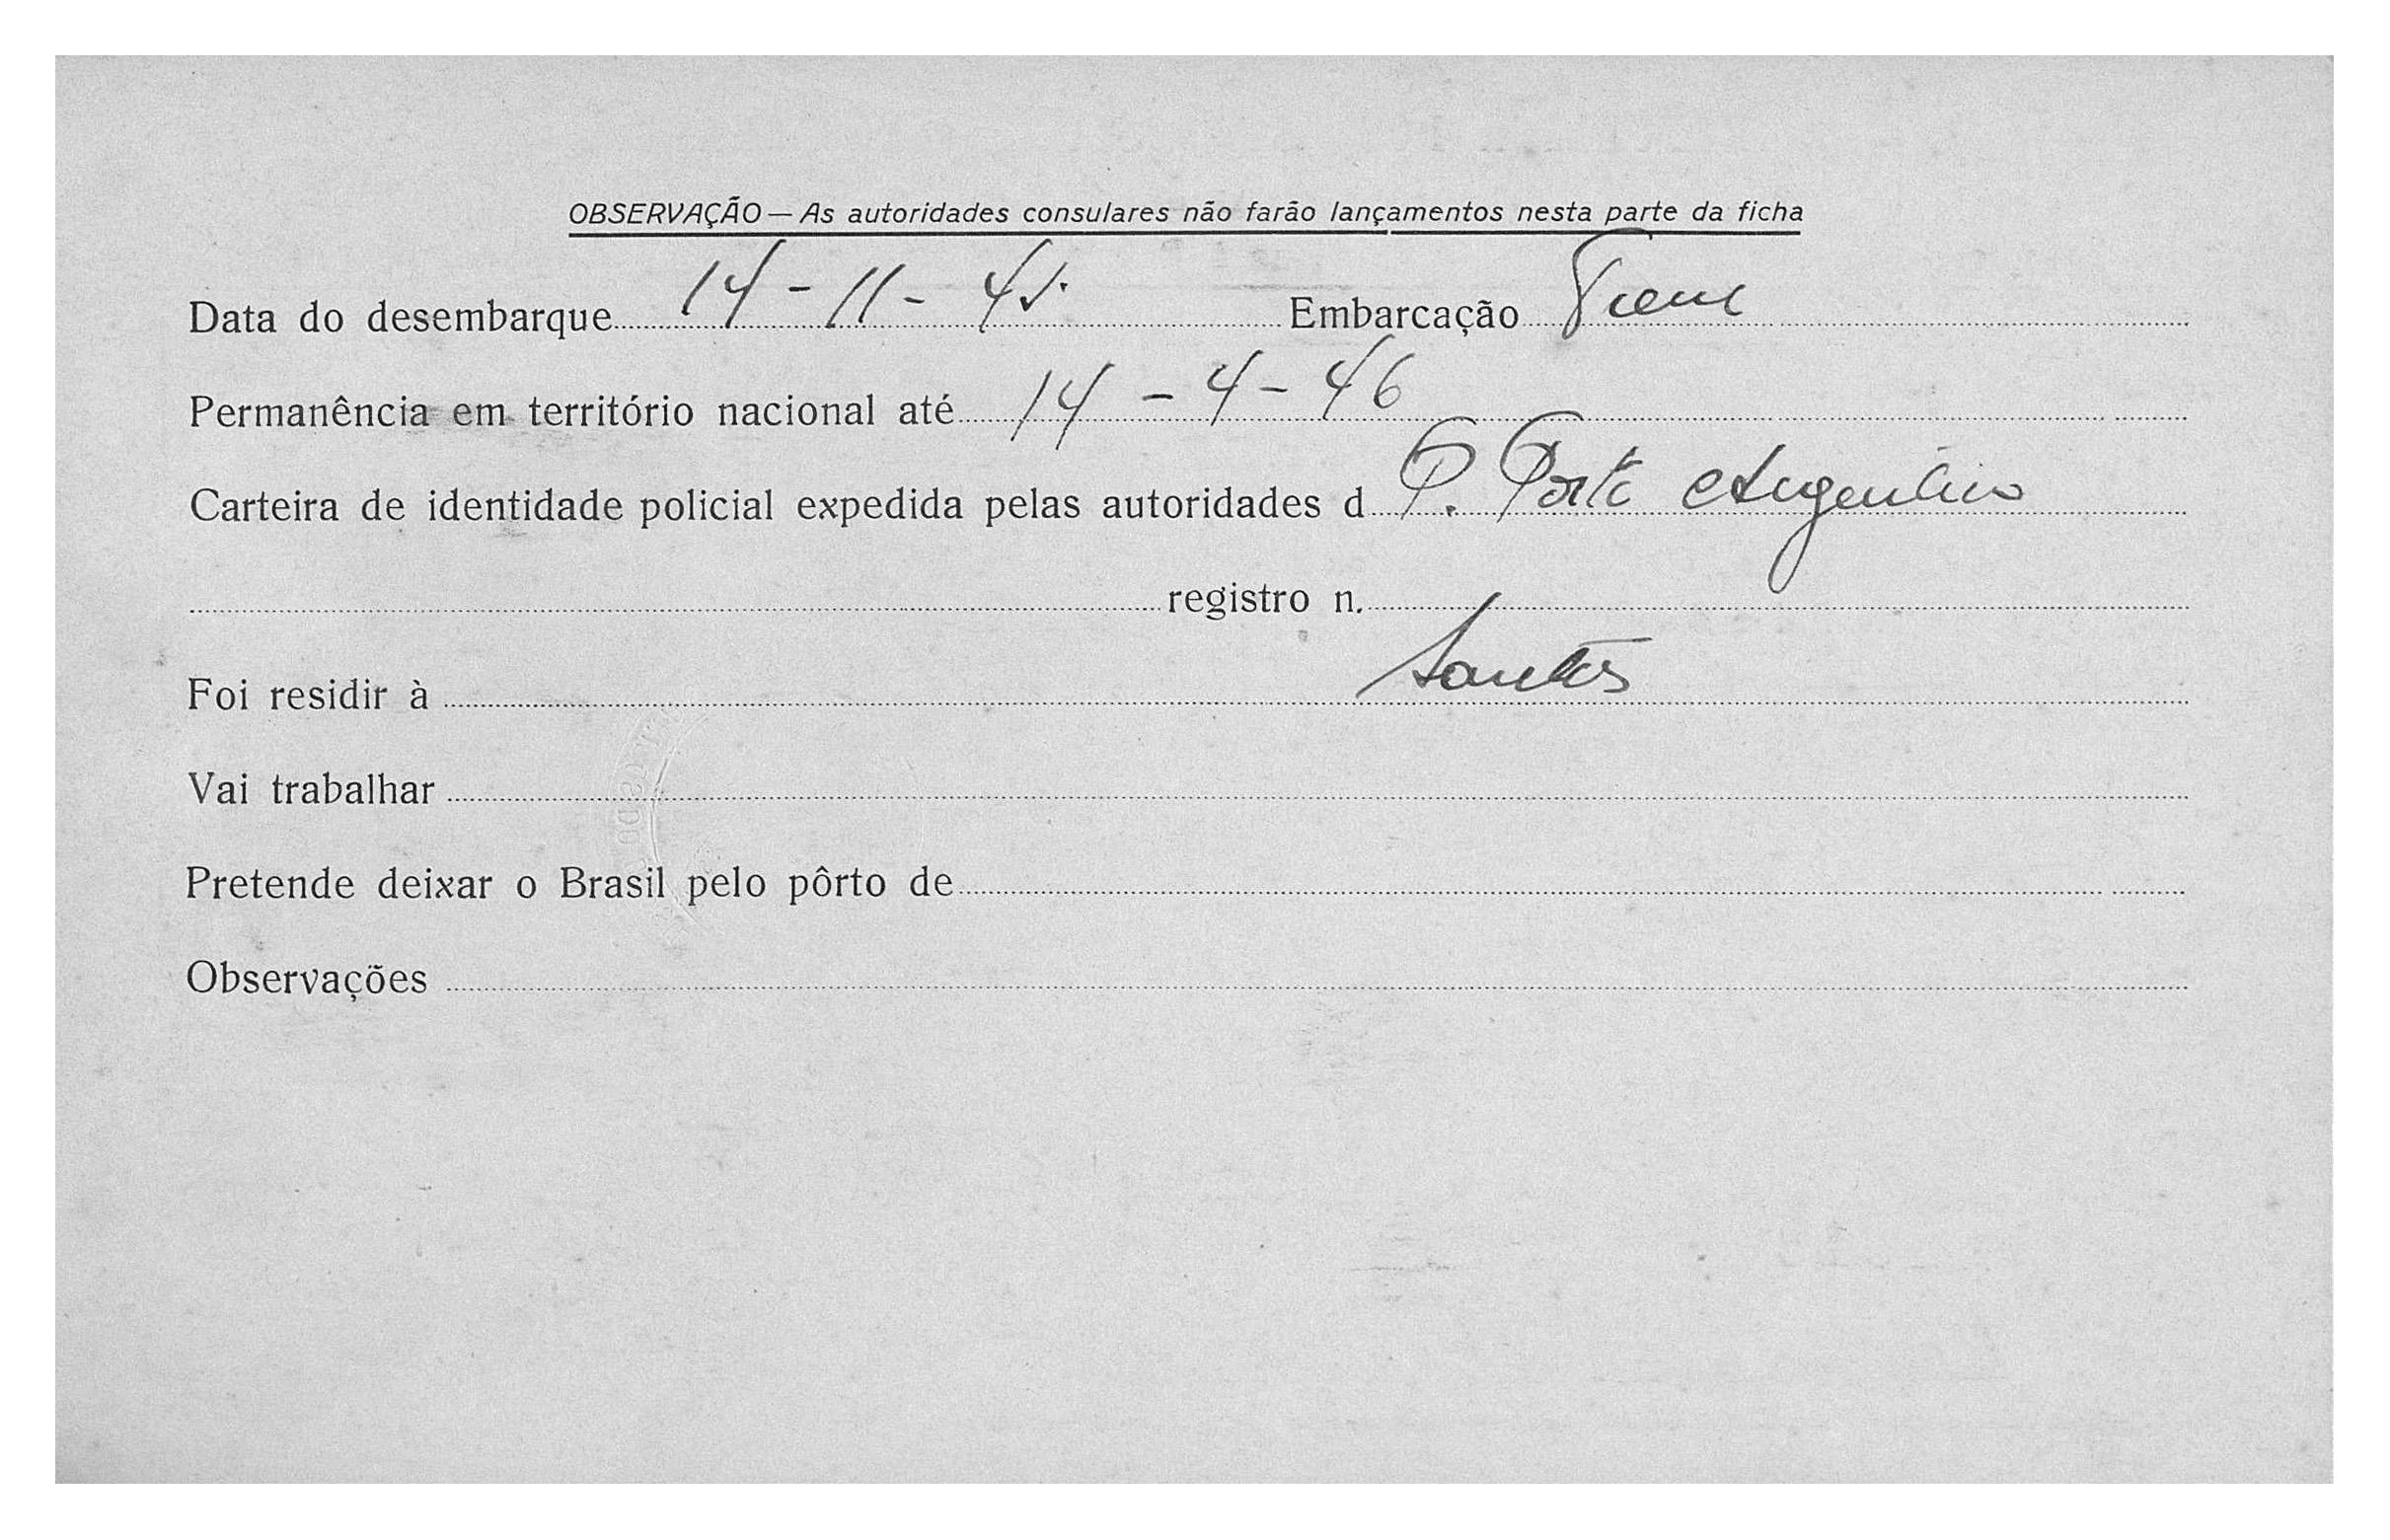 1945-10 - ficha consular - RJ - 02 copy